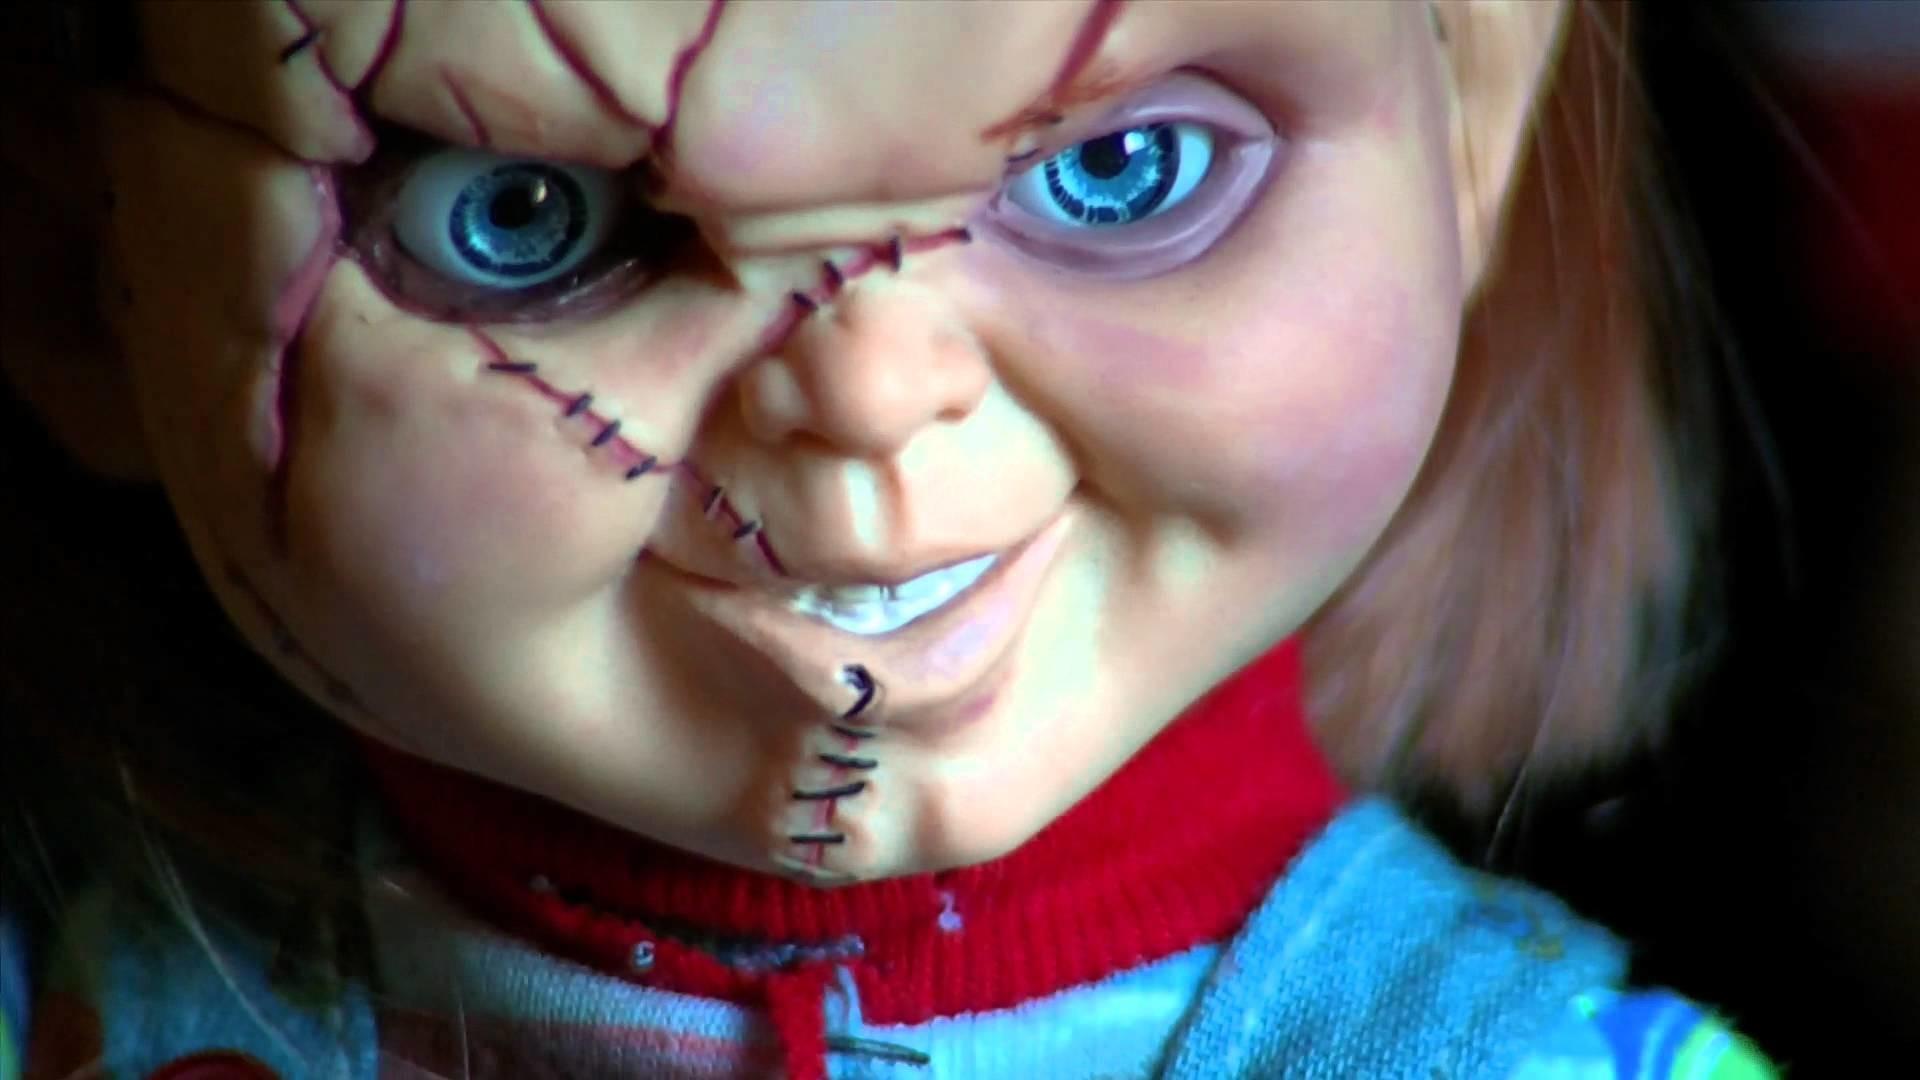 Chucky good guys dream rush